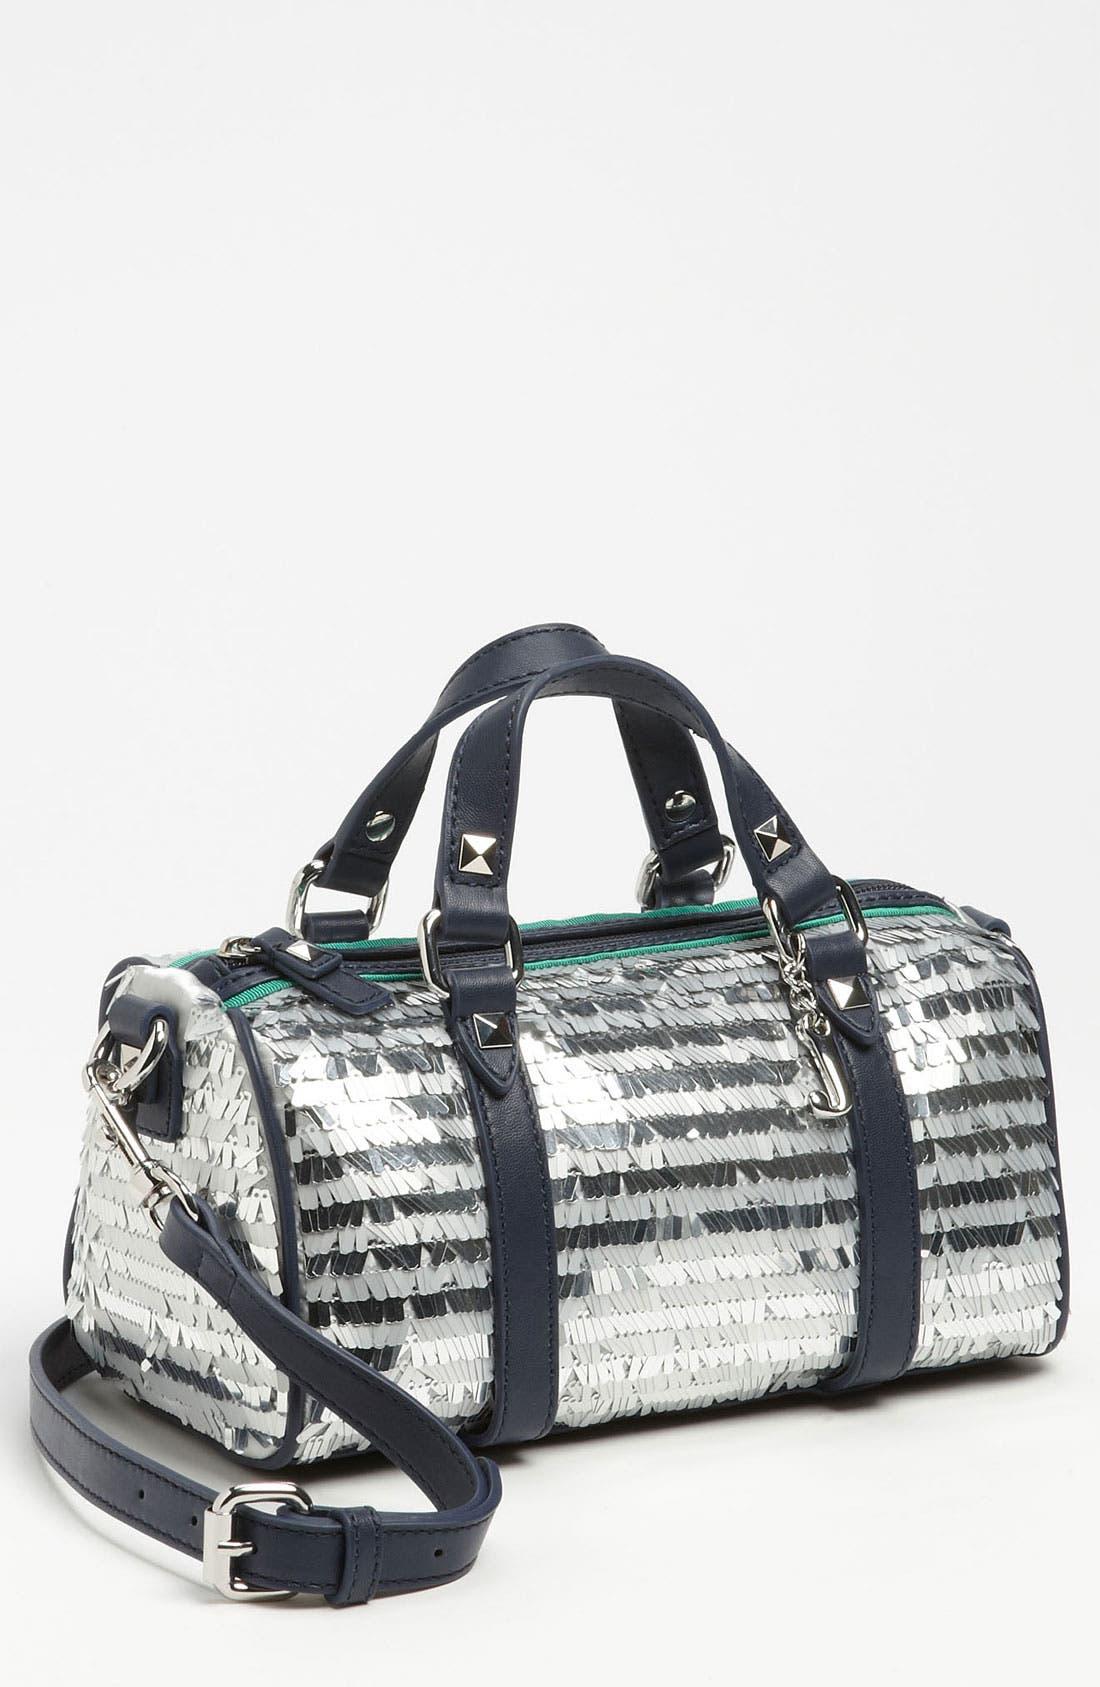 Alternate Image 1 Selected - Juicy Couture 'Mini Steffy' Bag (Girls)